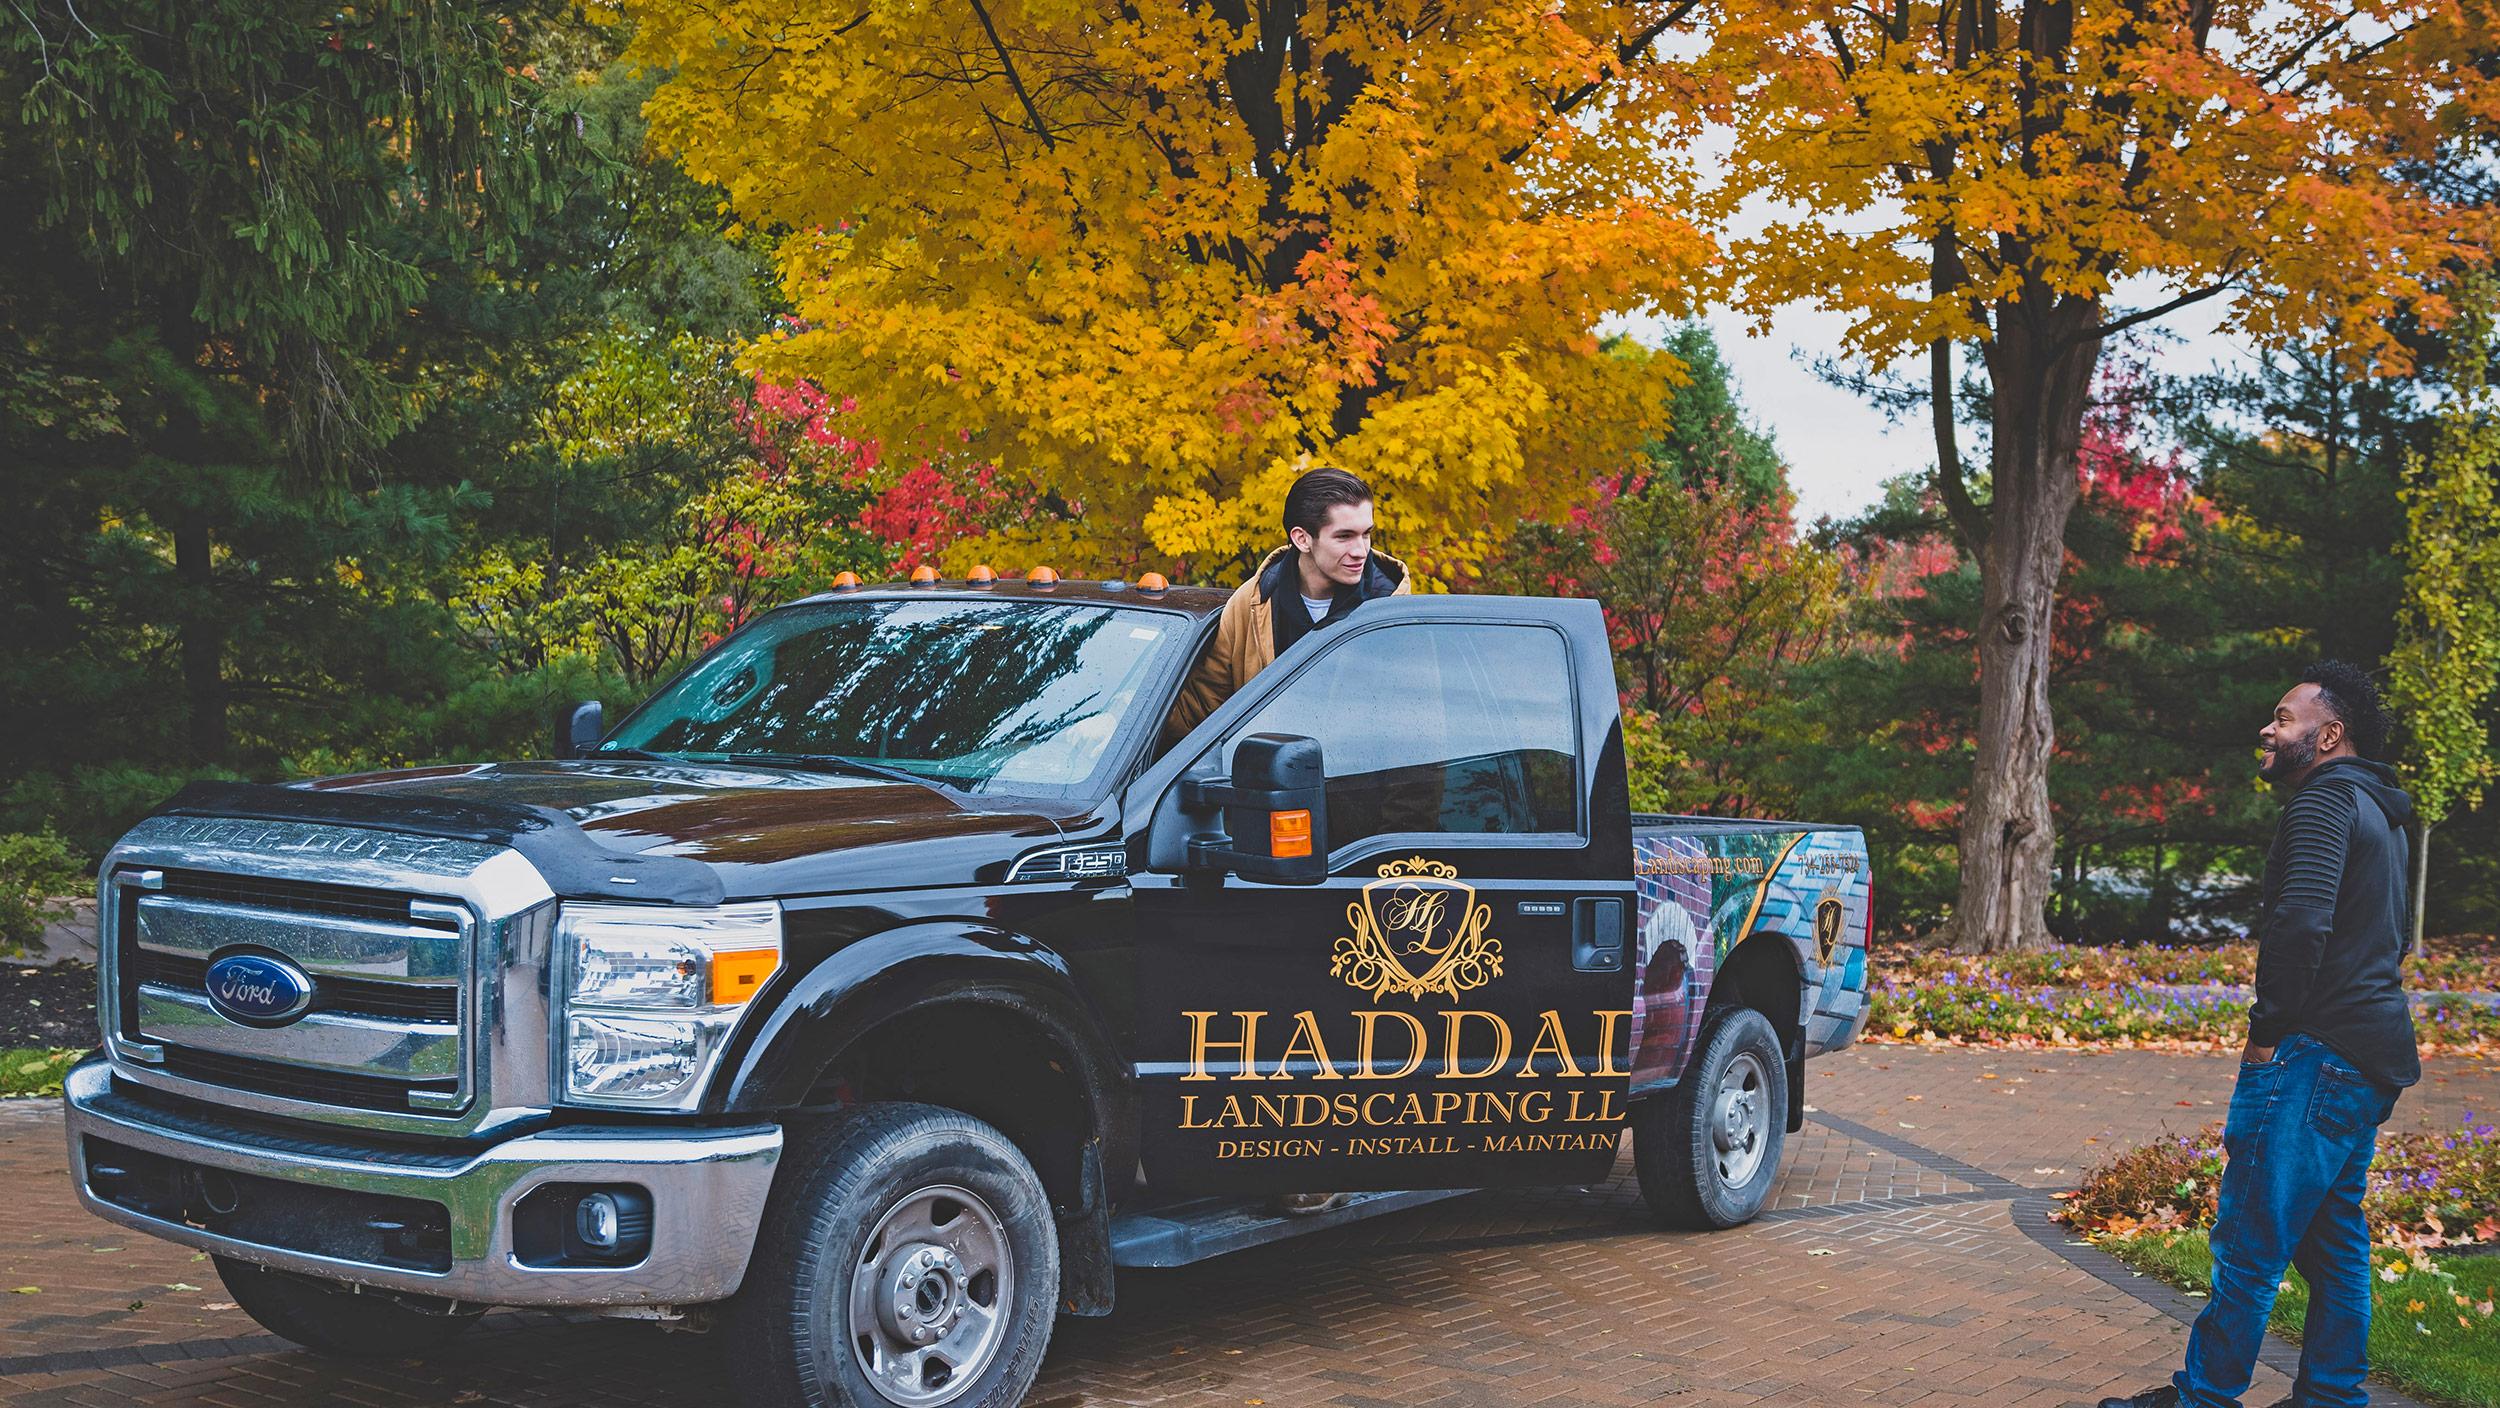 haddad-landscaping-home-slider-04.jpg